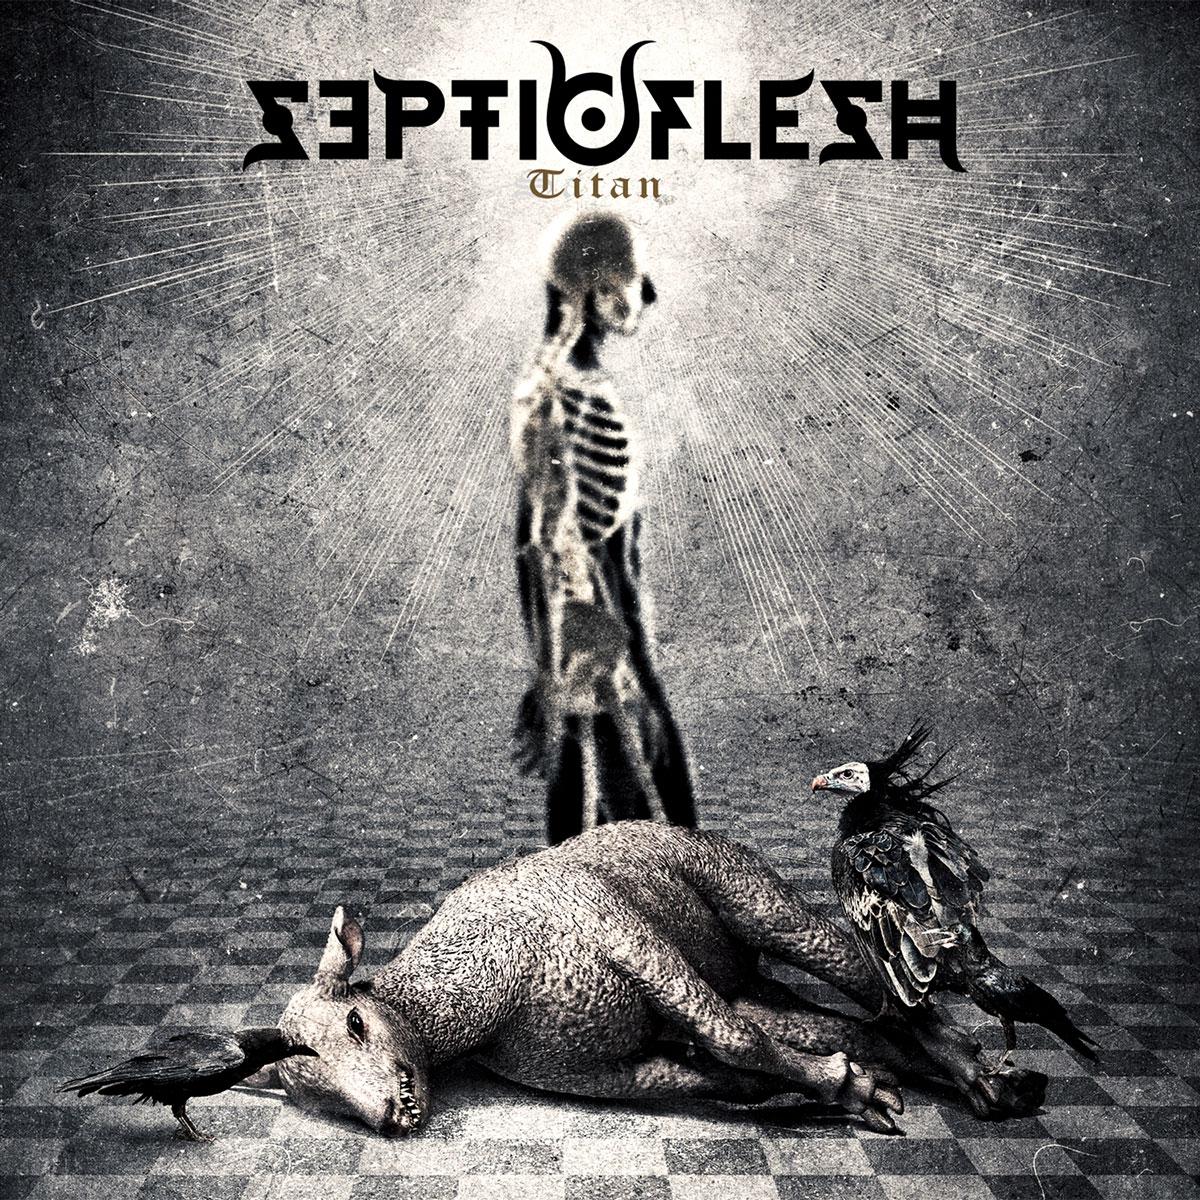 SepticFlesh-4